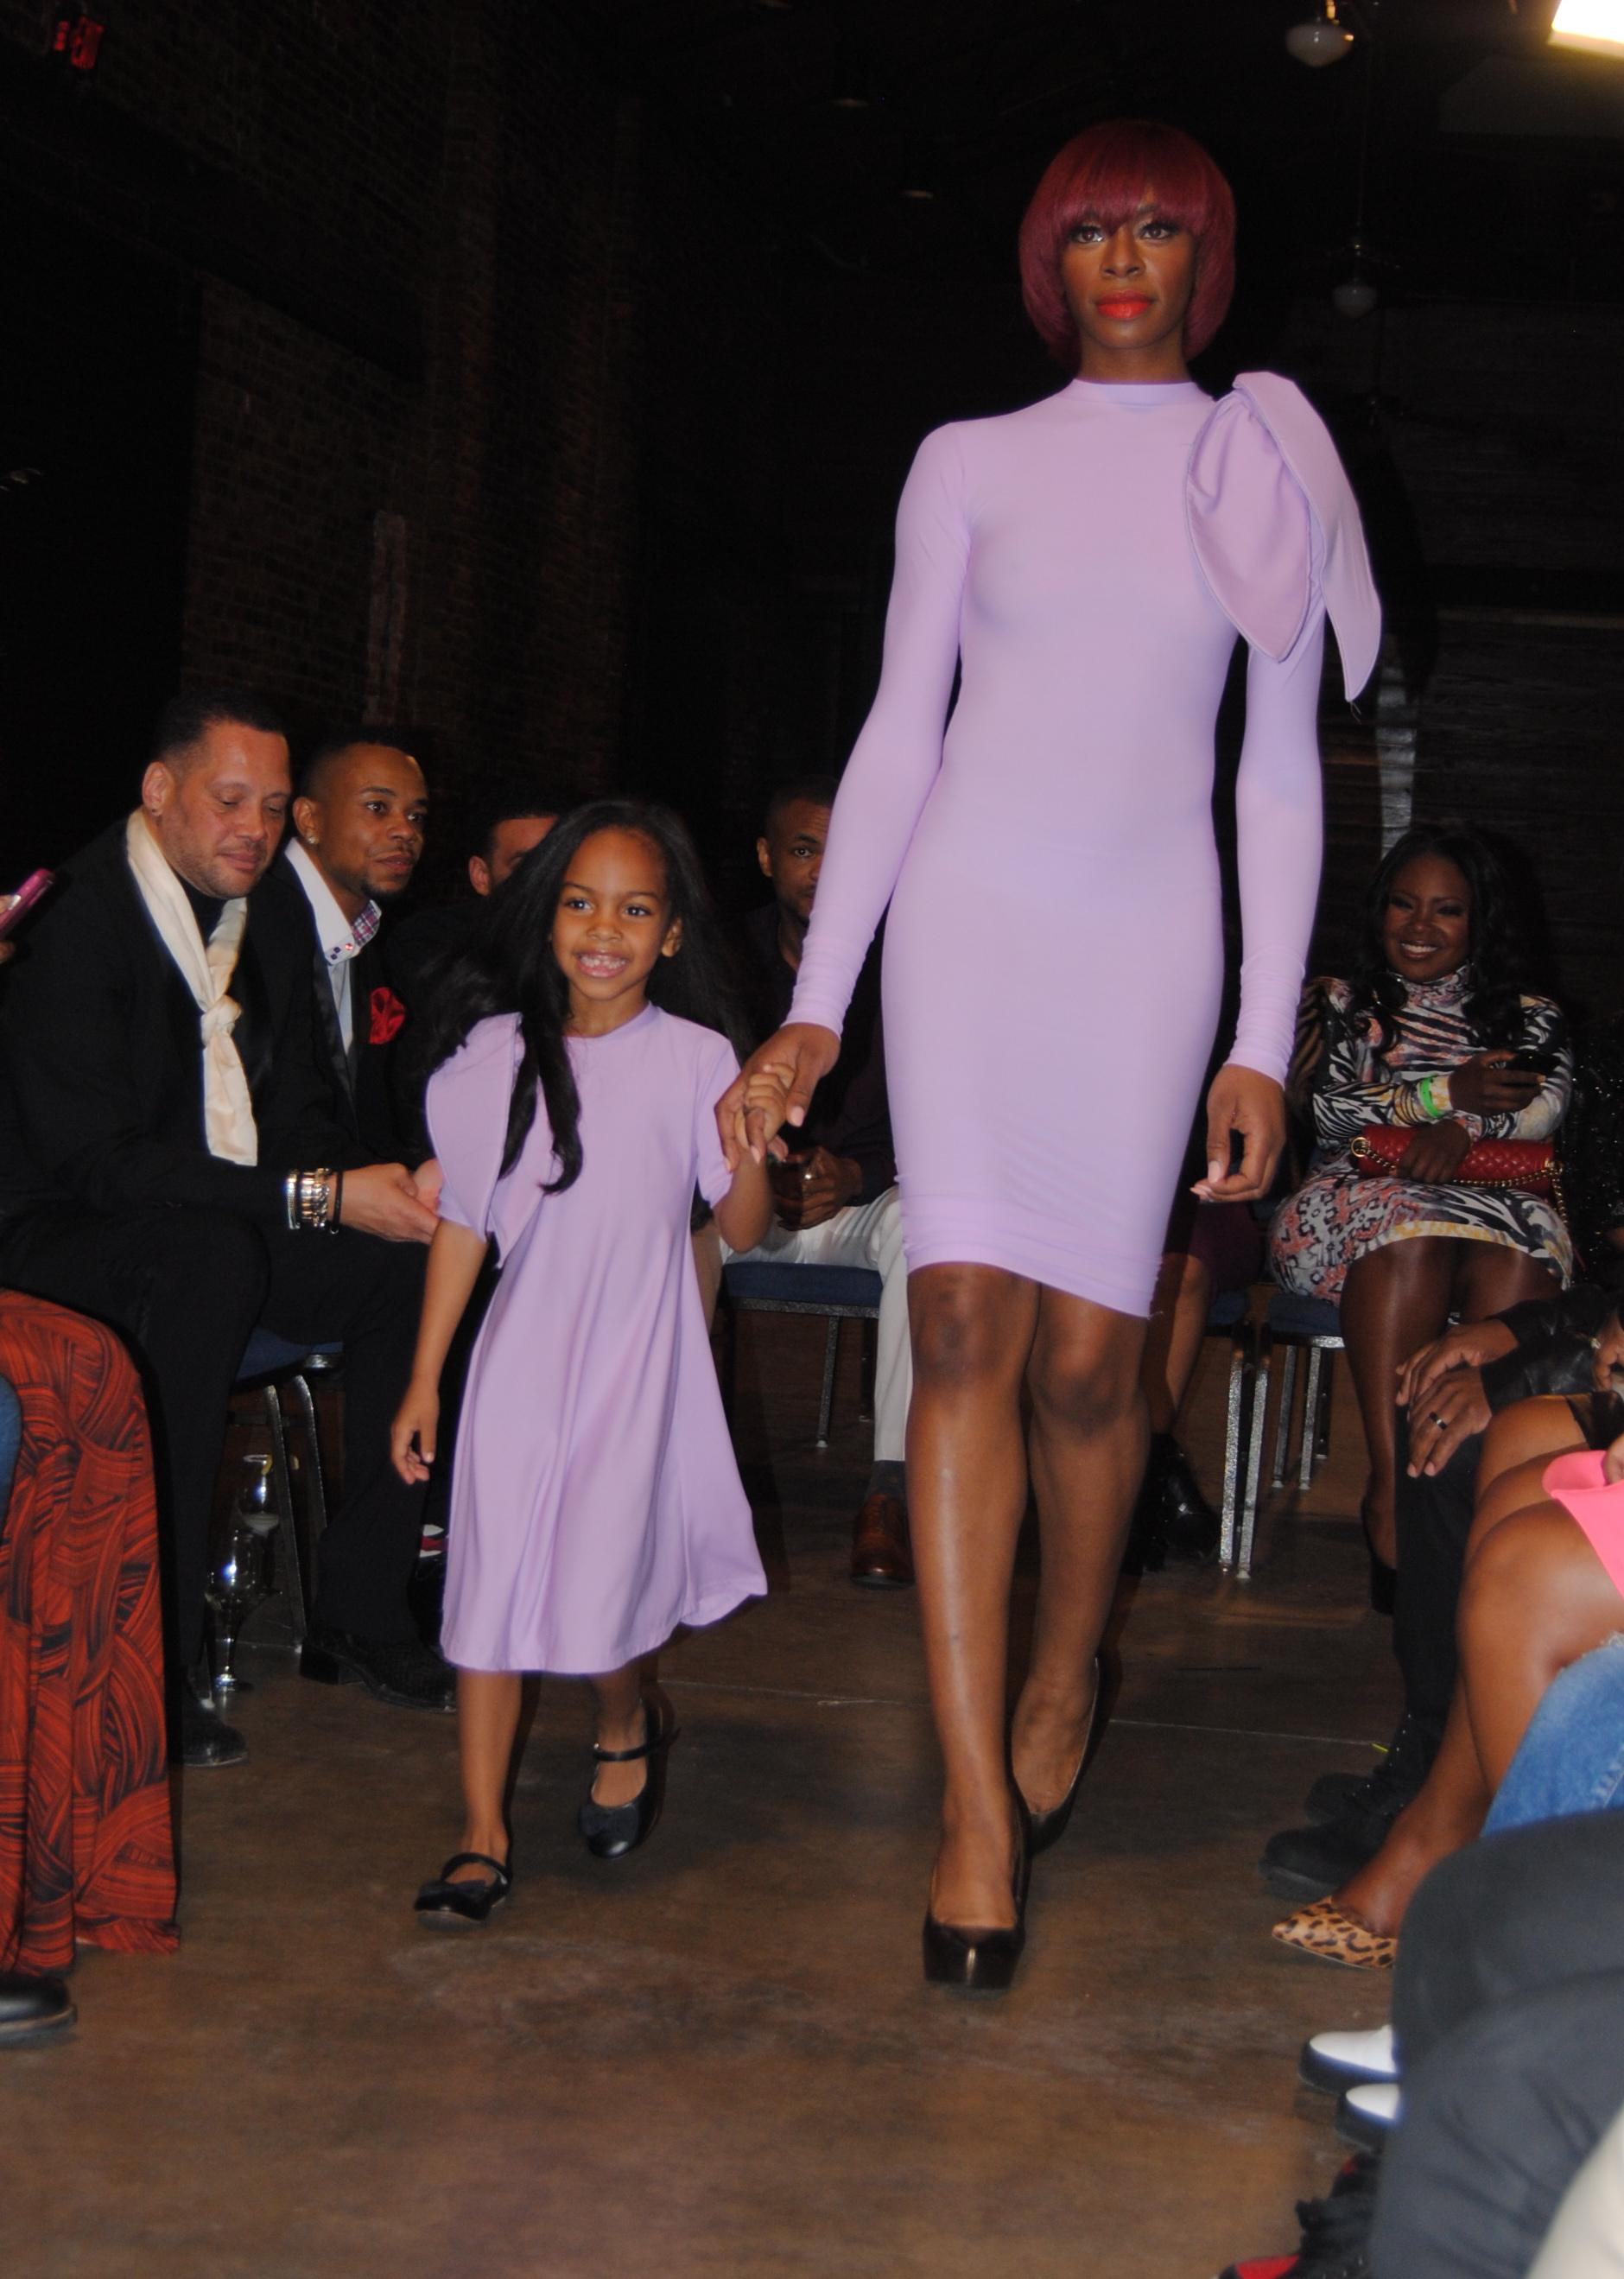 Pint-Sized Fashionistas Strut Their Stuff At House of Chapple Fashion Show!